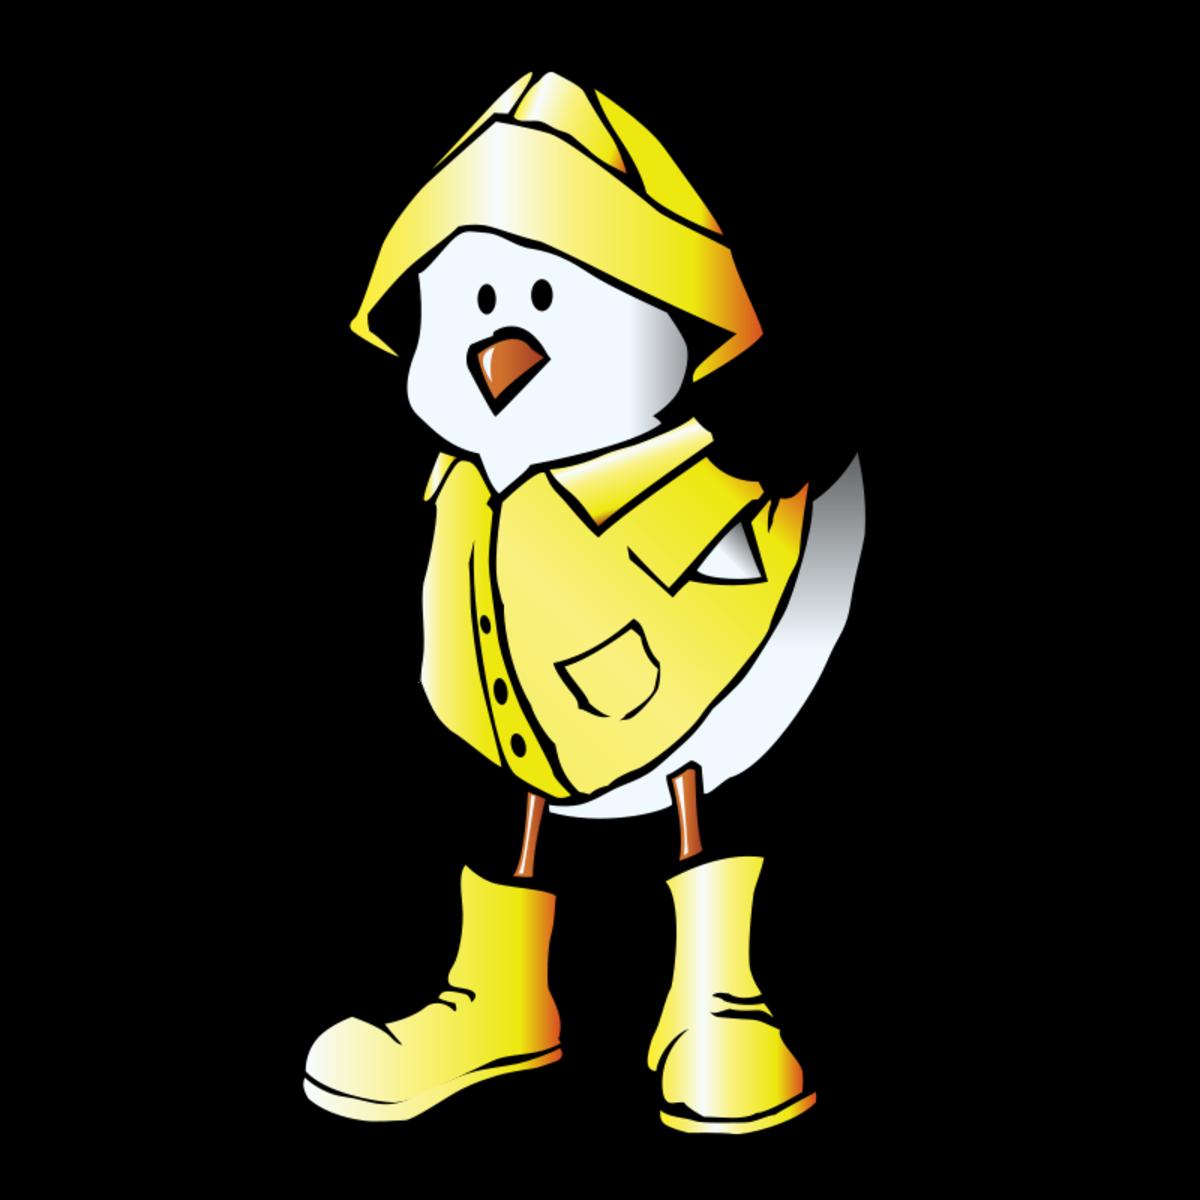 Cartoon Duck in a Raincoat